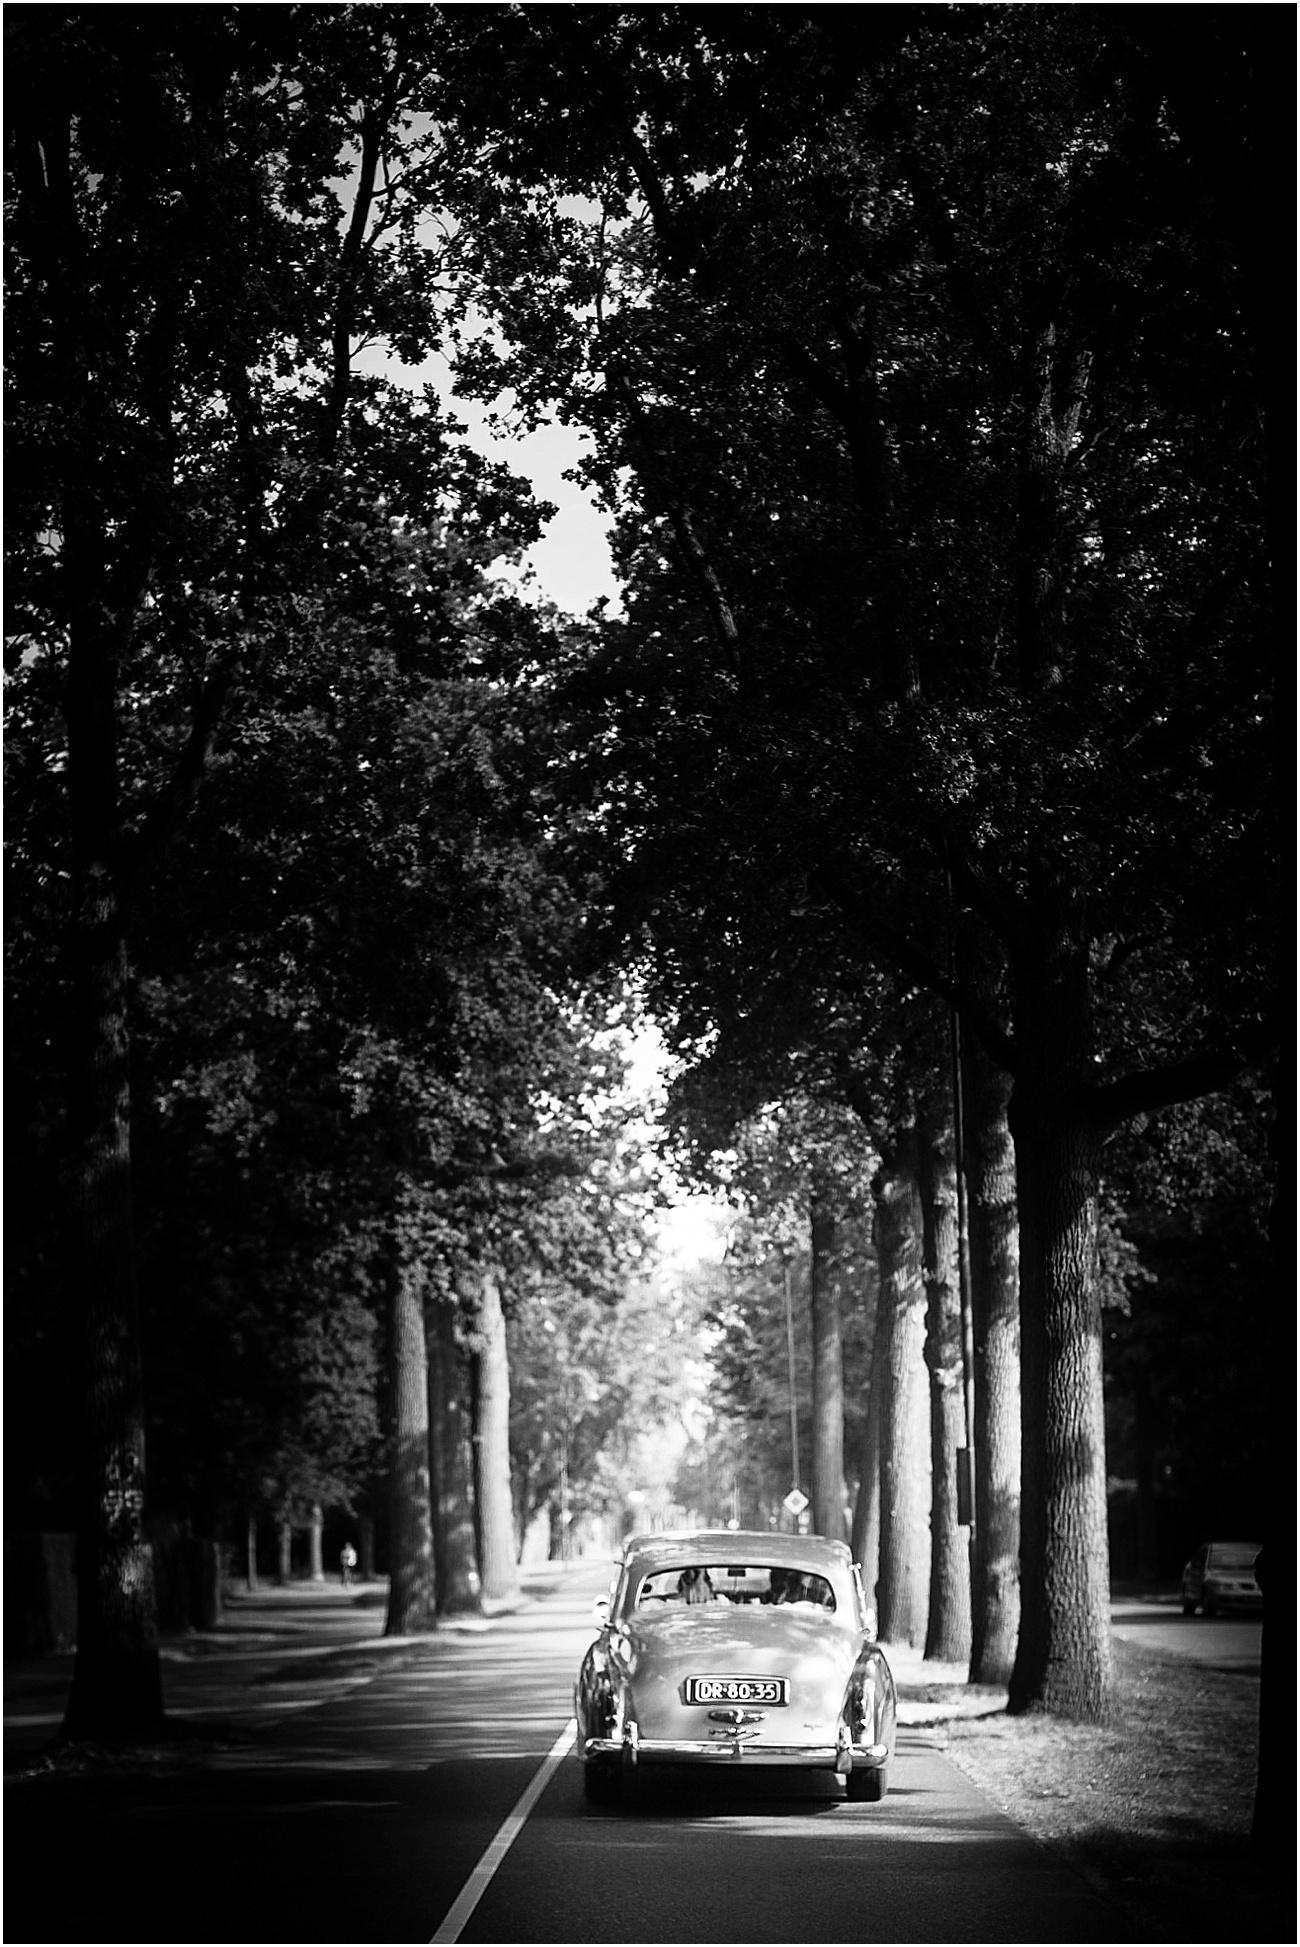 MichaelHabraken|photography_0826.jpg